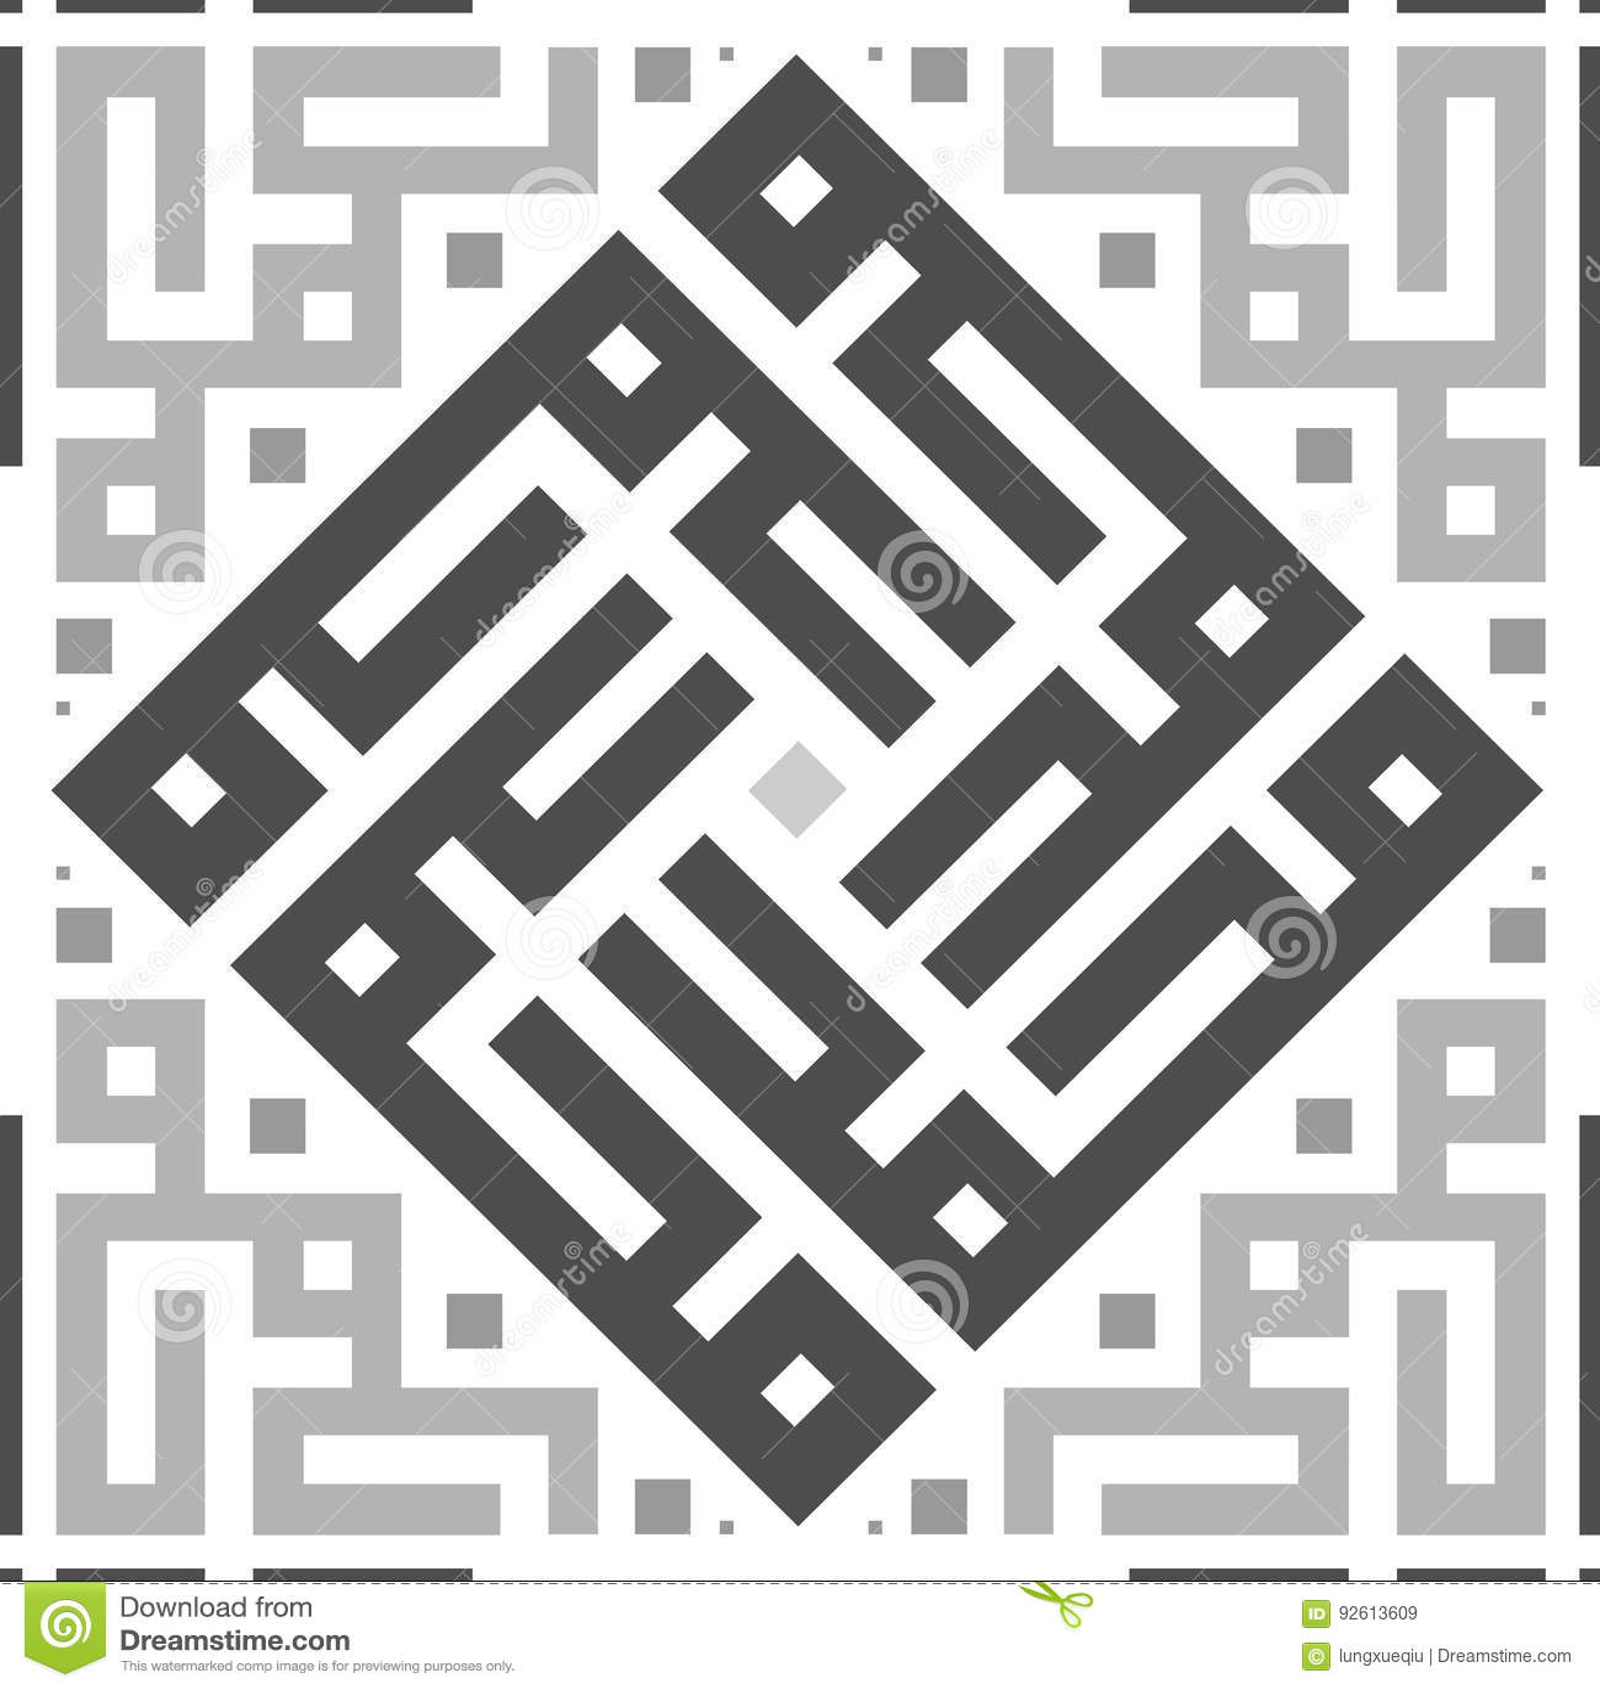 Transparent Ornament Tile Design Repetitive Seamless Pattern Stock